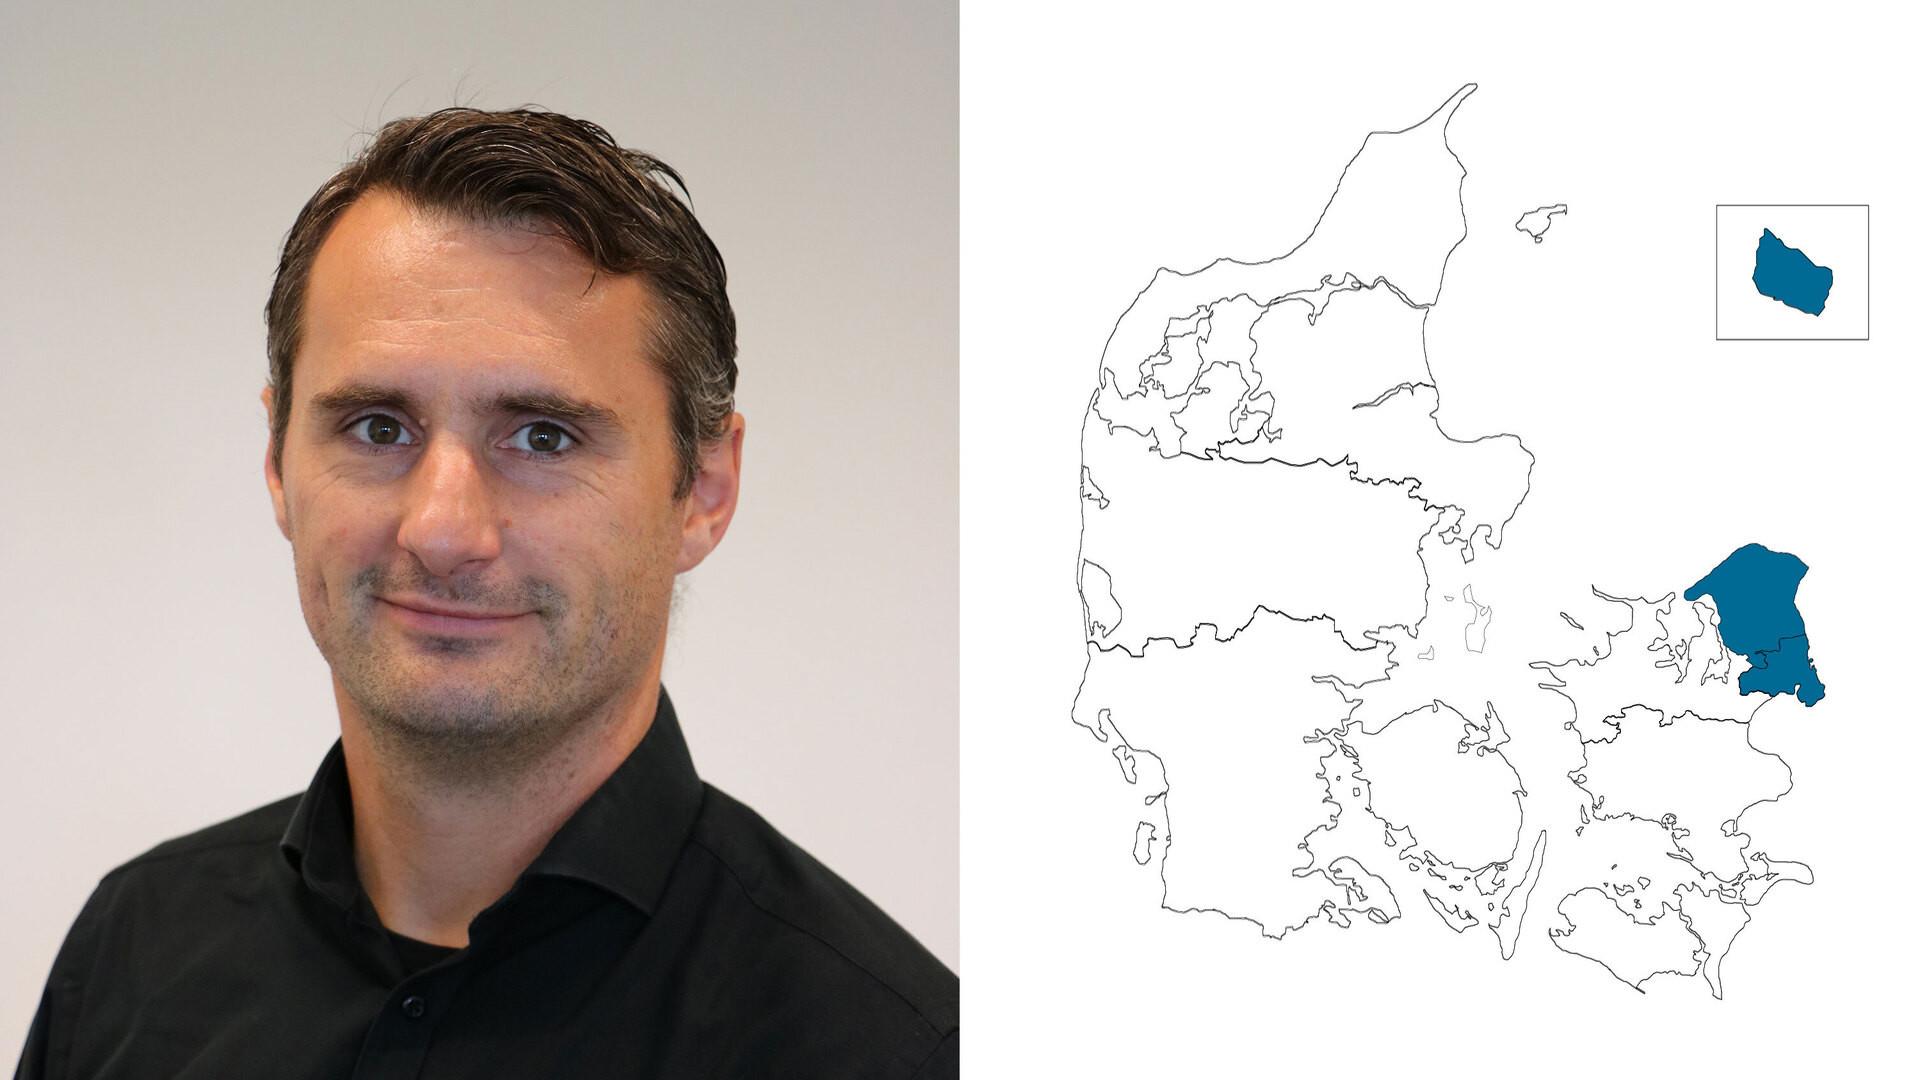 contact person, sales representative, profile and map, sealand and islands, finn jørgensen, DK